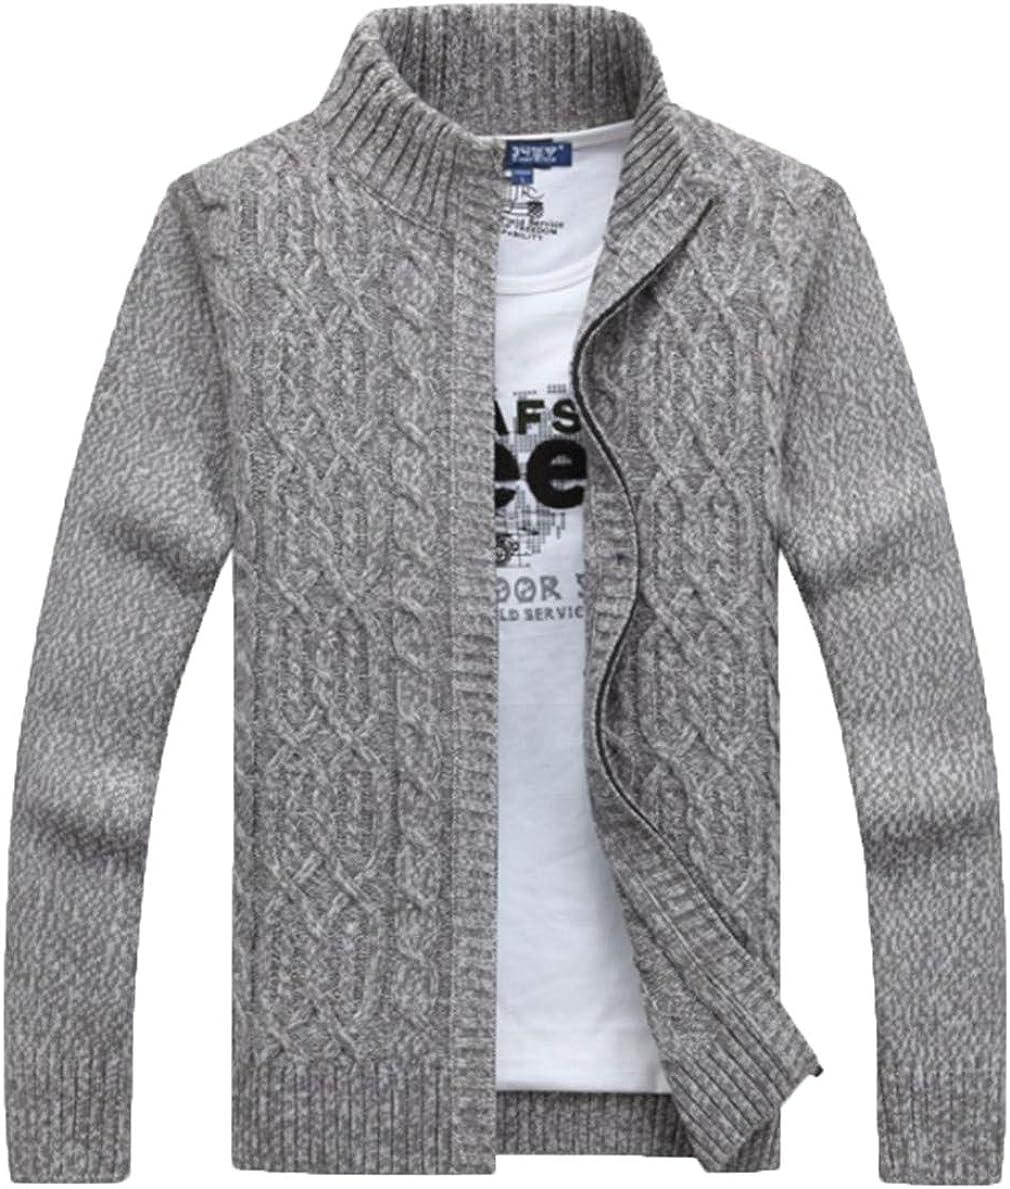 Mens Sweaters Winter Thickening Warm Cashmere Sweater Zipper Cardigan Grey Black Sweater